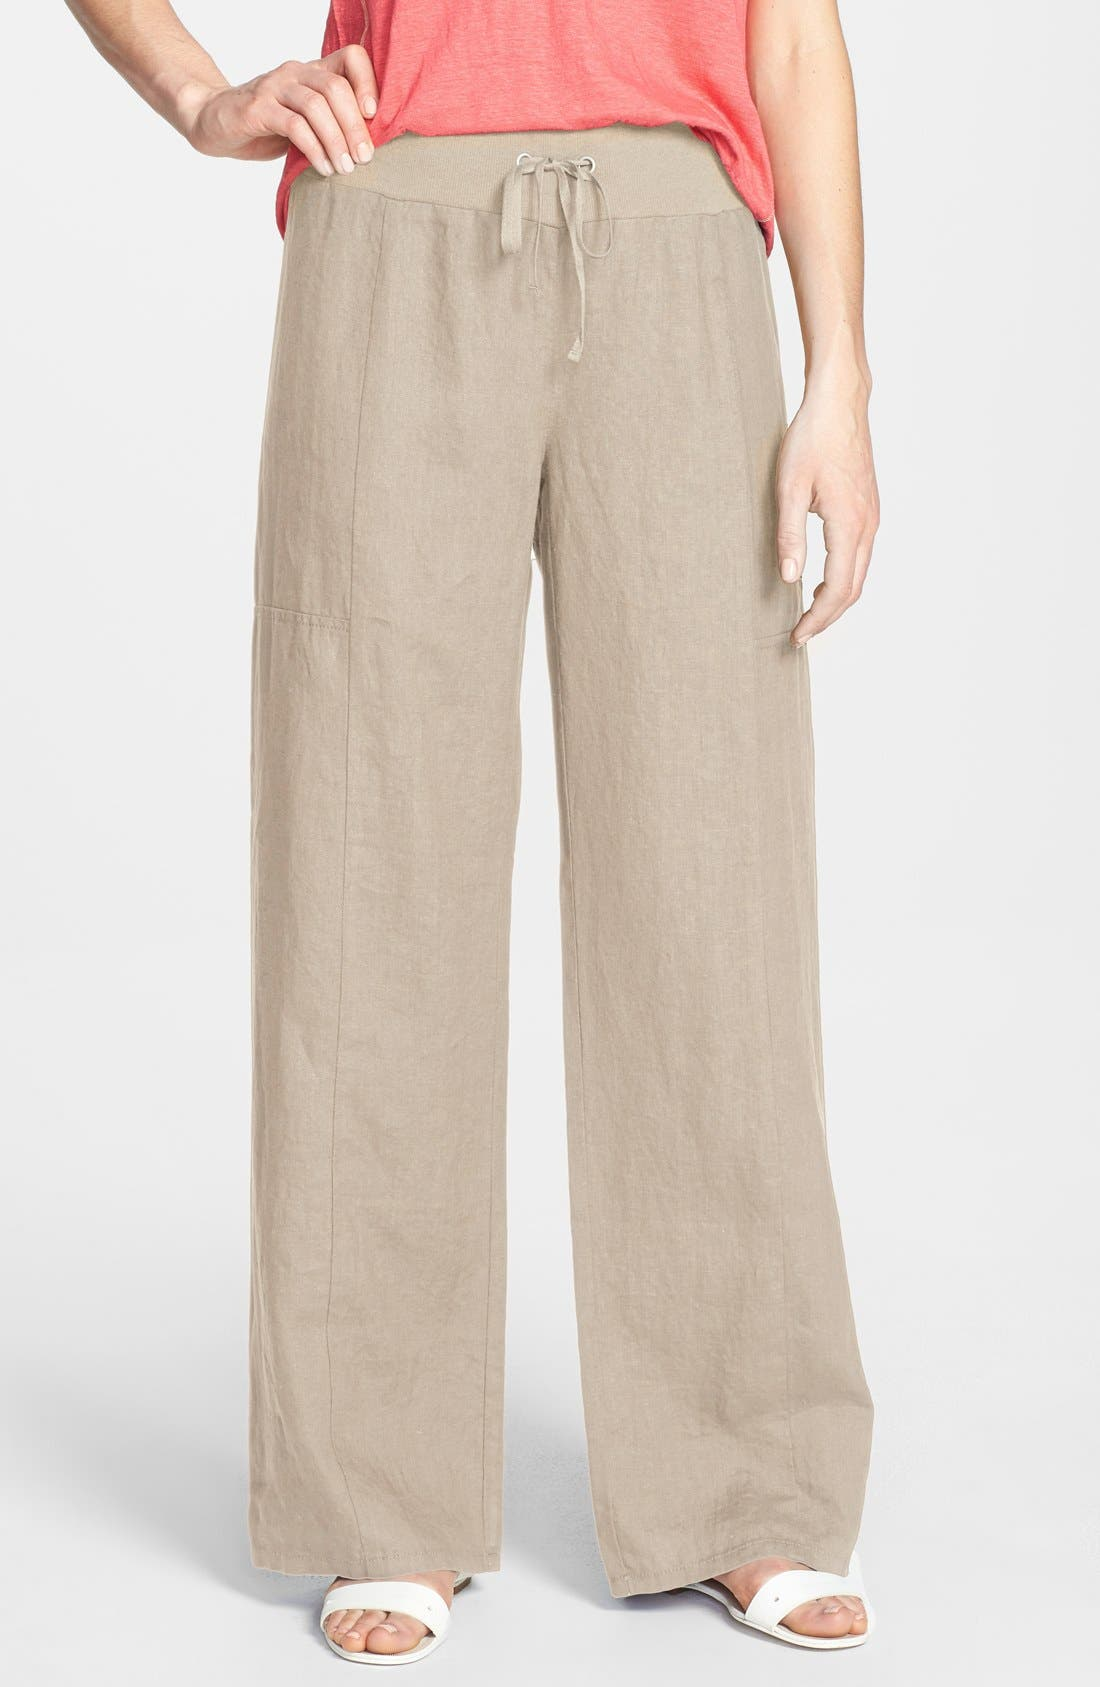 Main Image - Eileen Fisher Wide Leg Linen Pants (Regular & Petite) (Online Only)